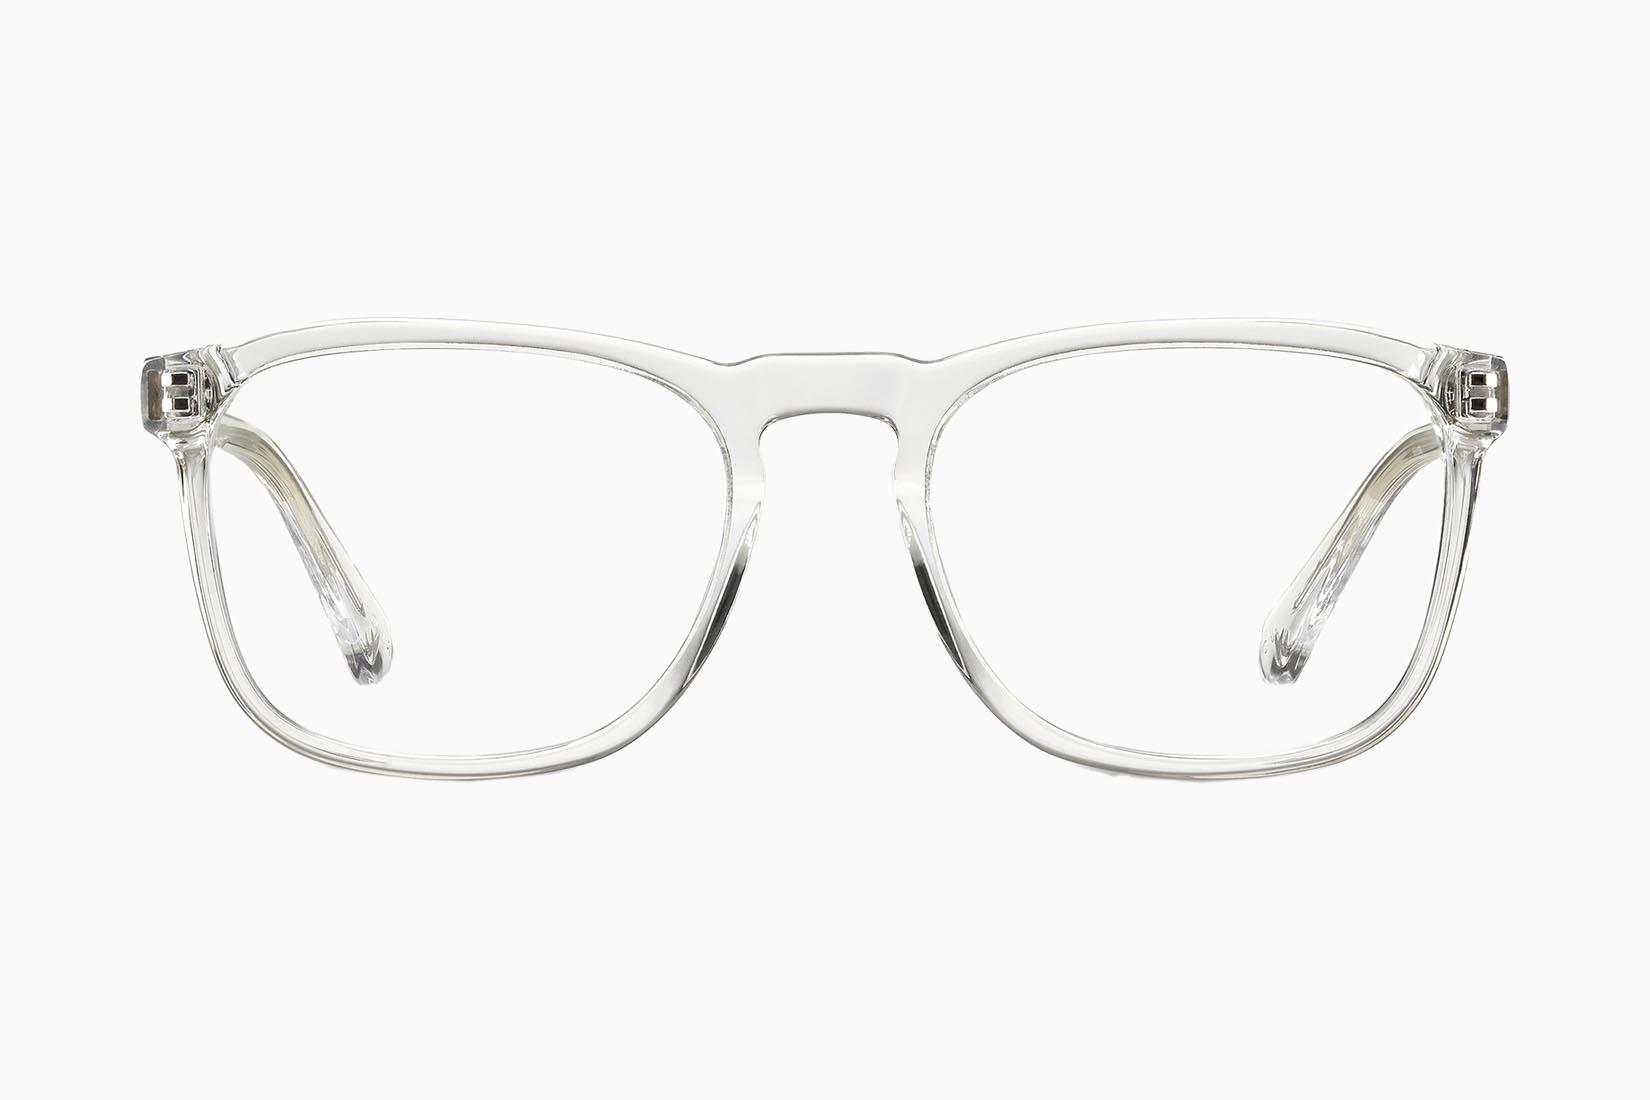 best blue light blocking glasses Vincero review Luxe Digital